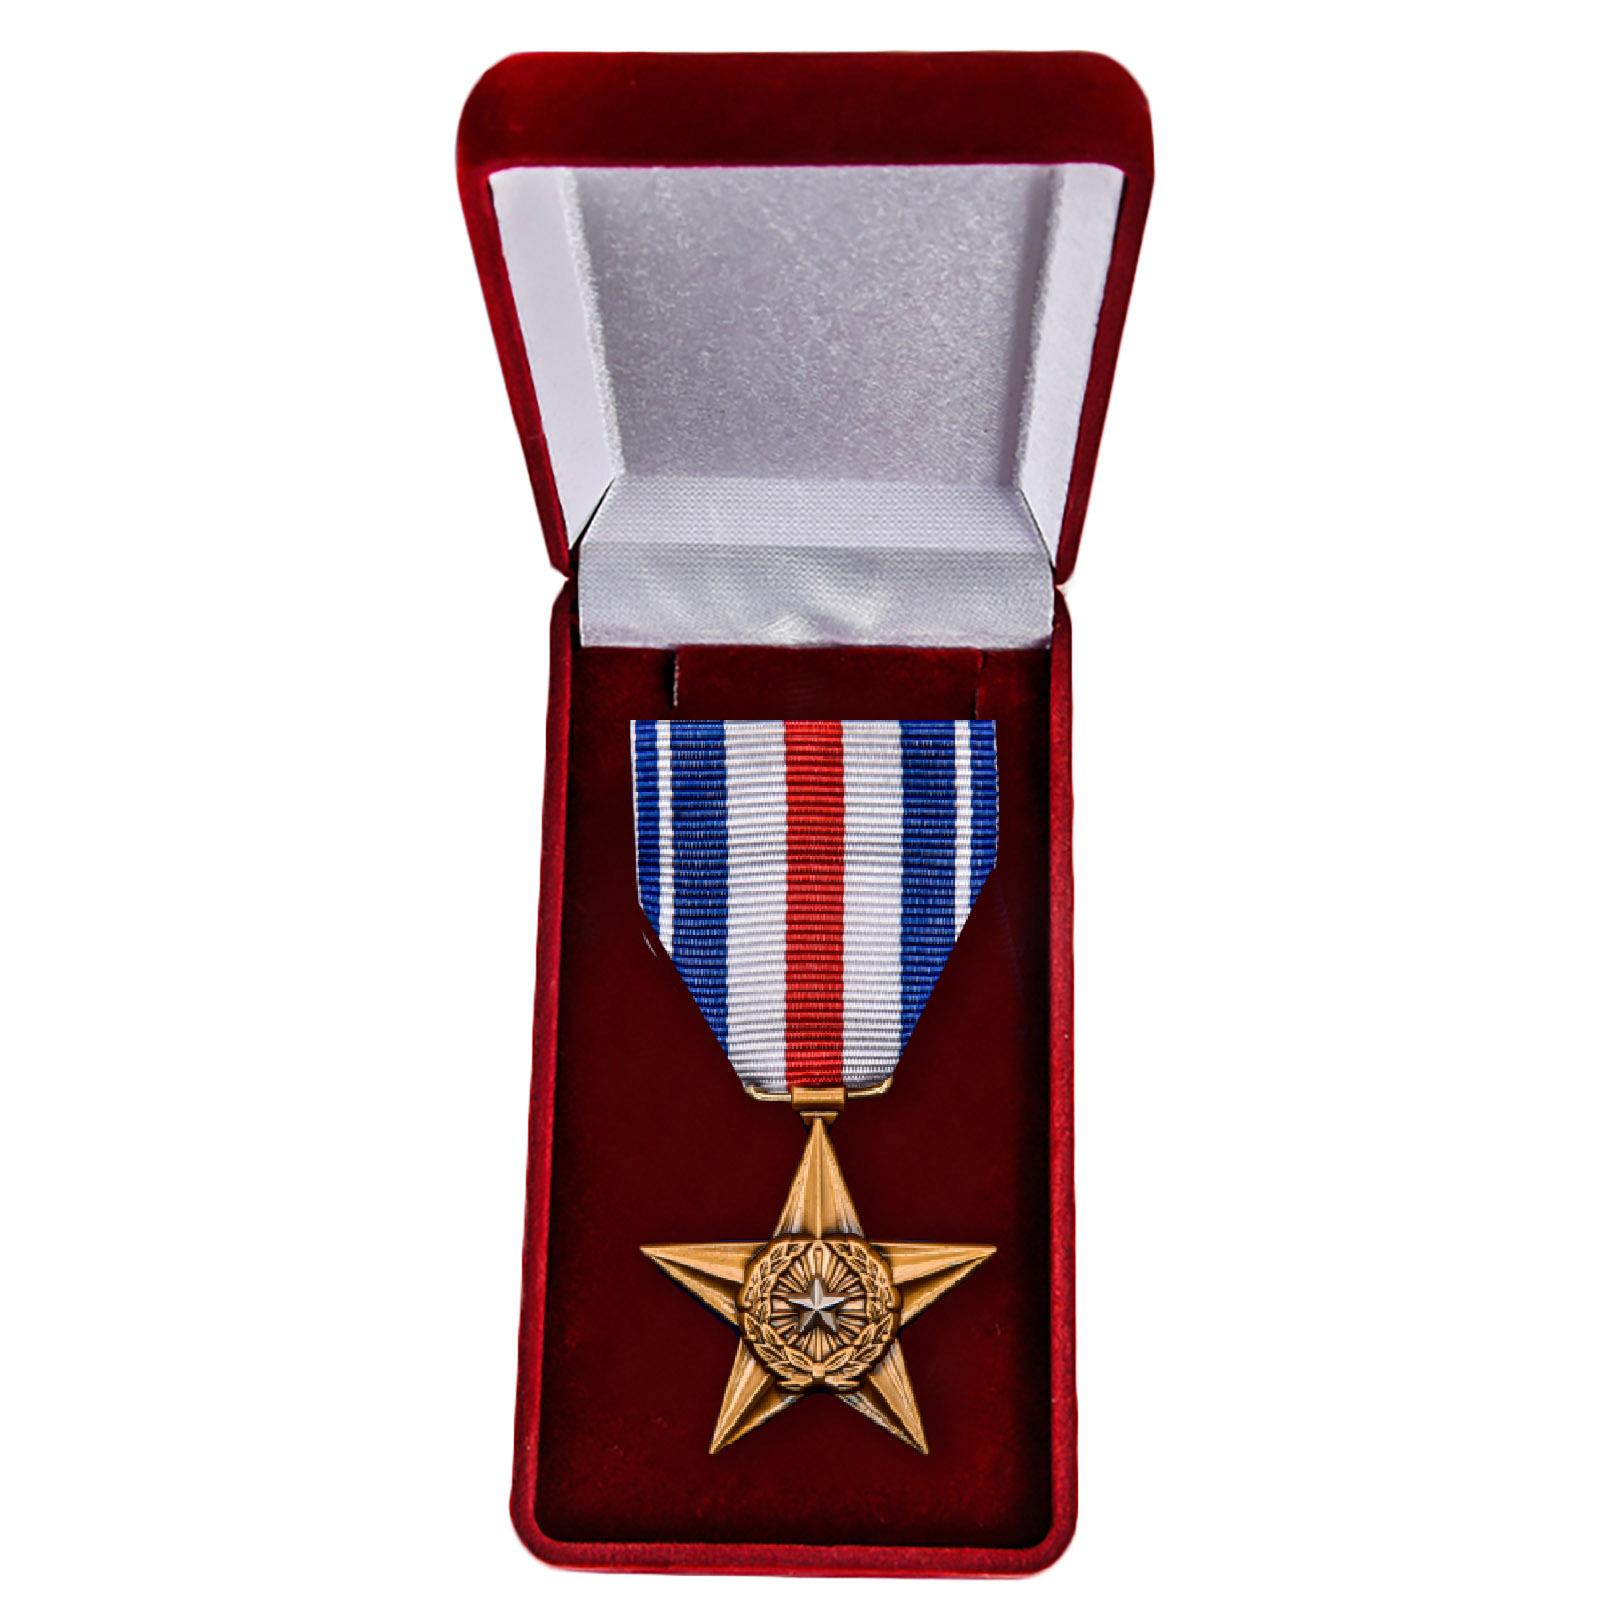 Памятная медаль Серебряная звезда (США) - в футляре